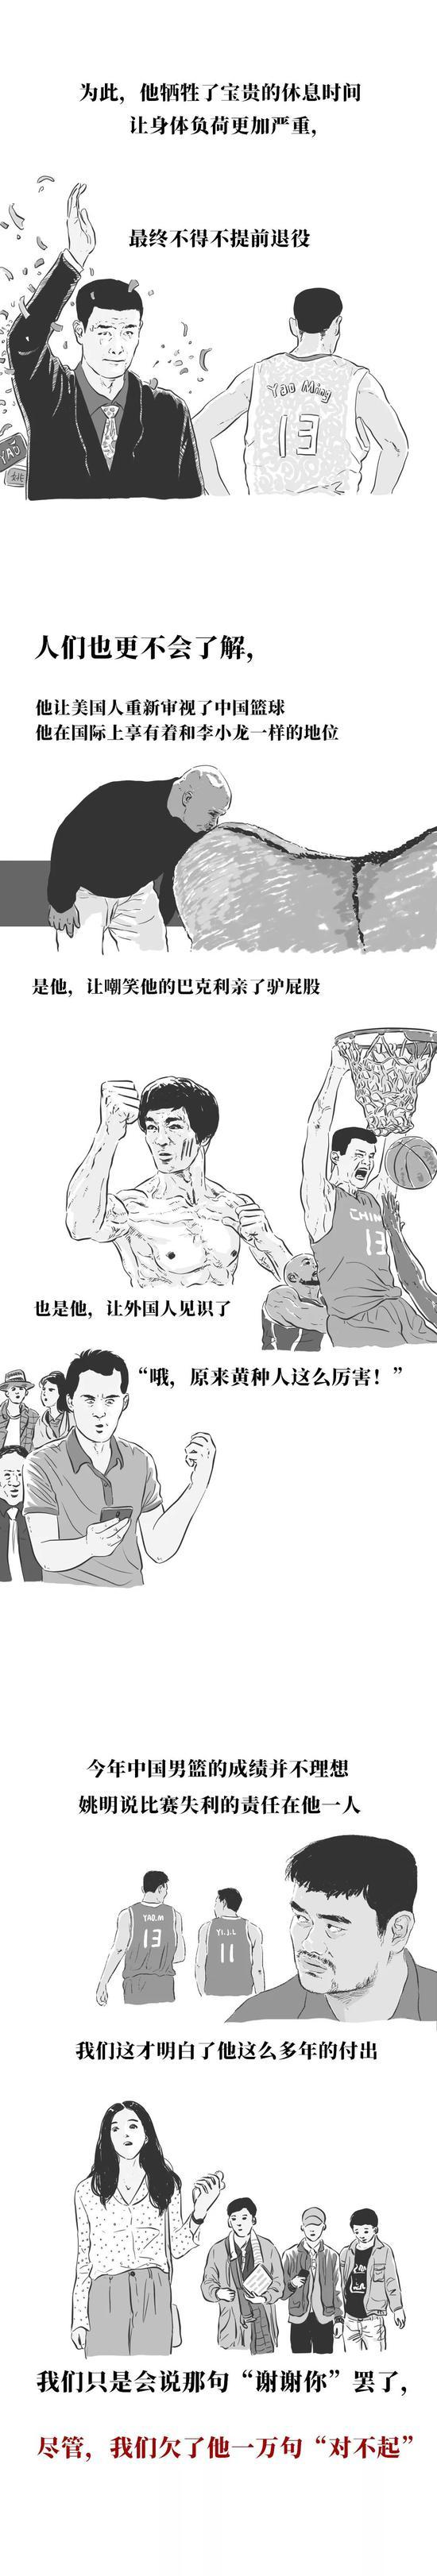 青岛体彩_首页